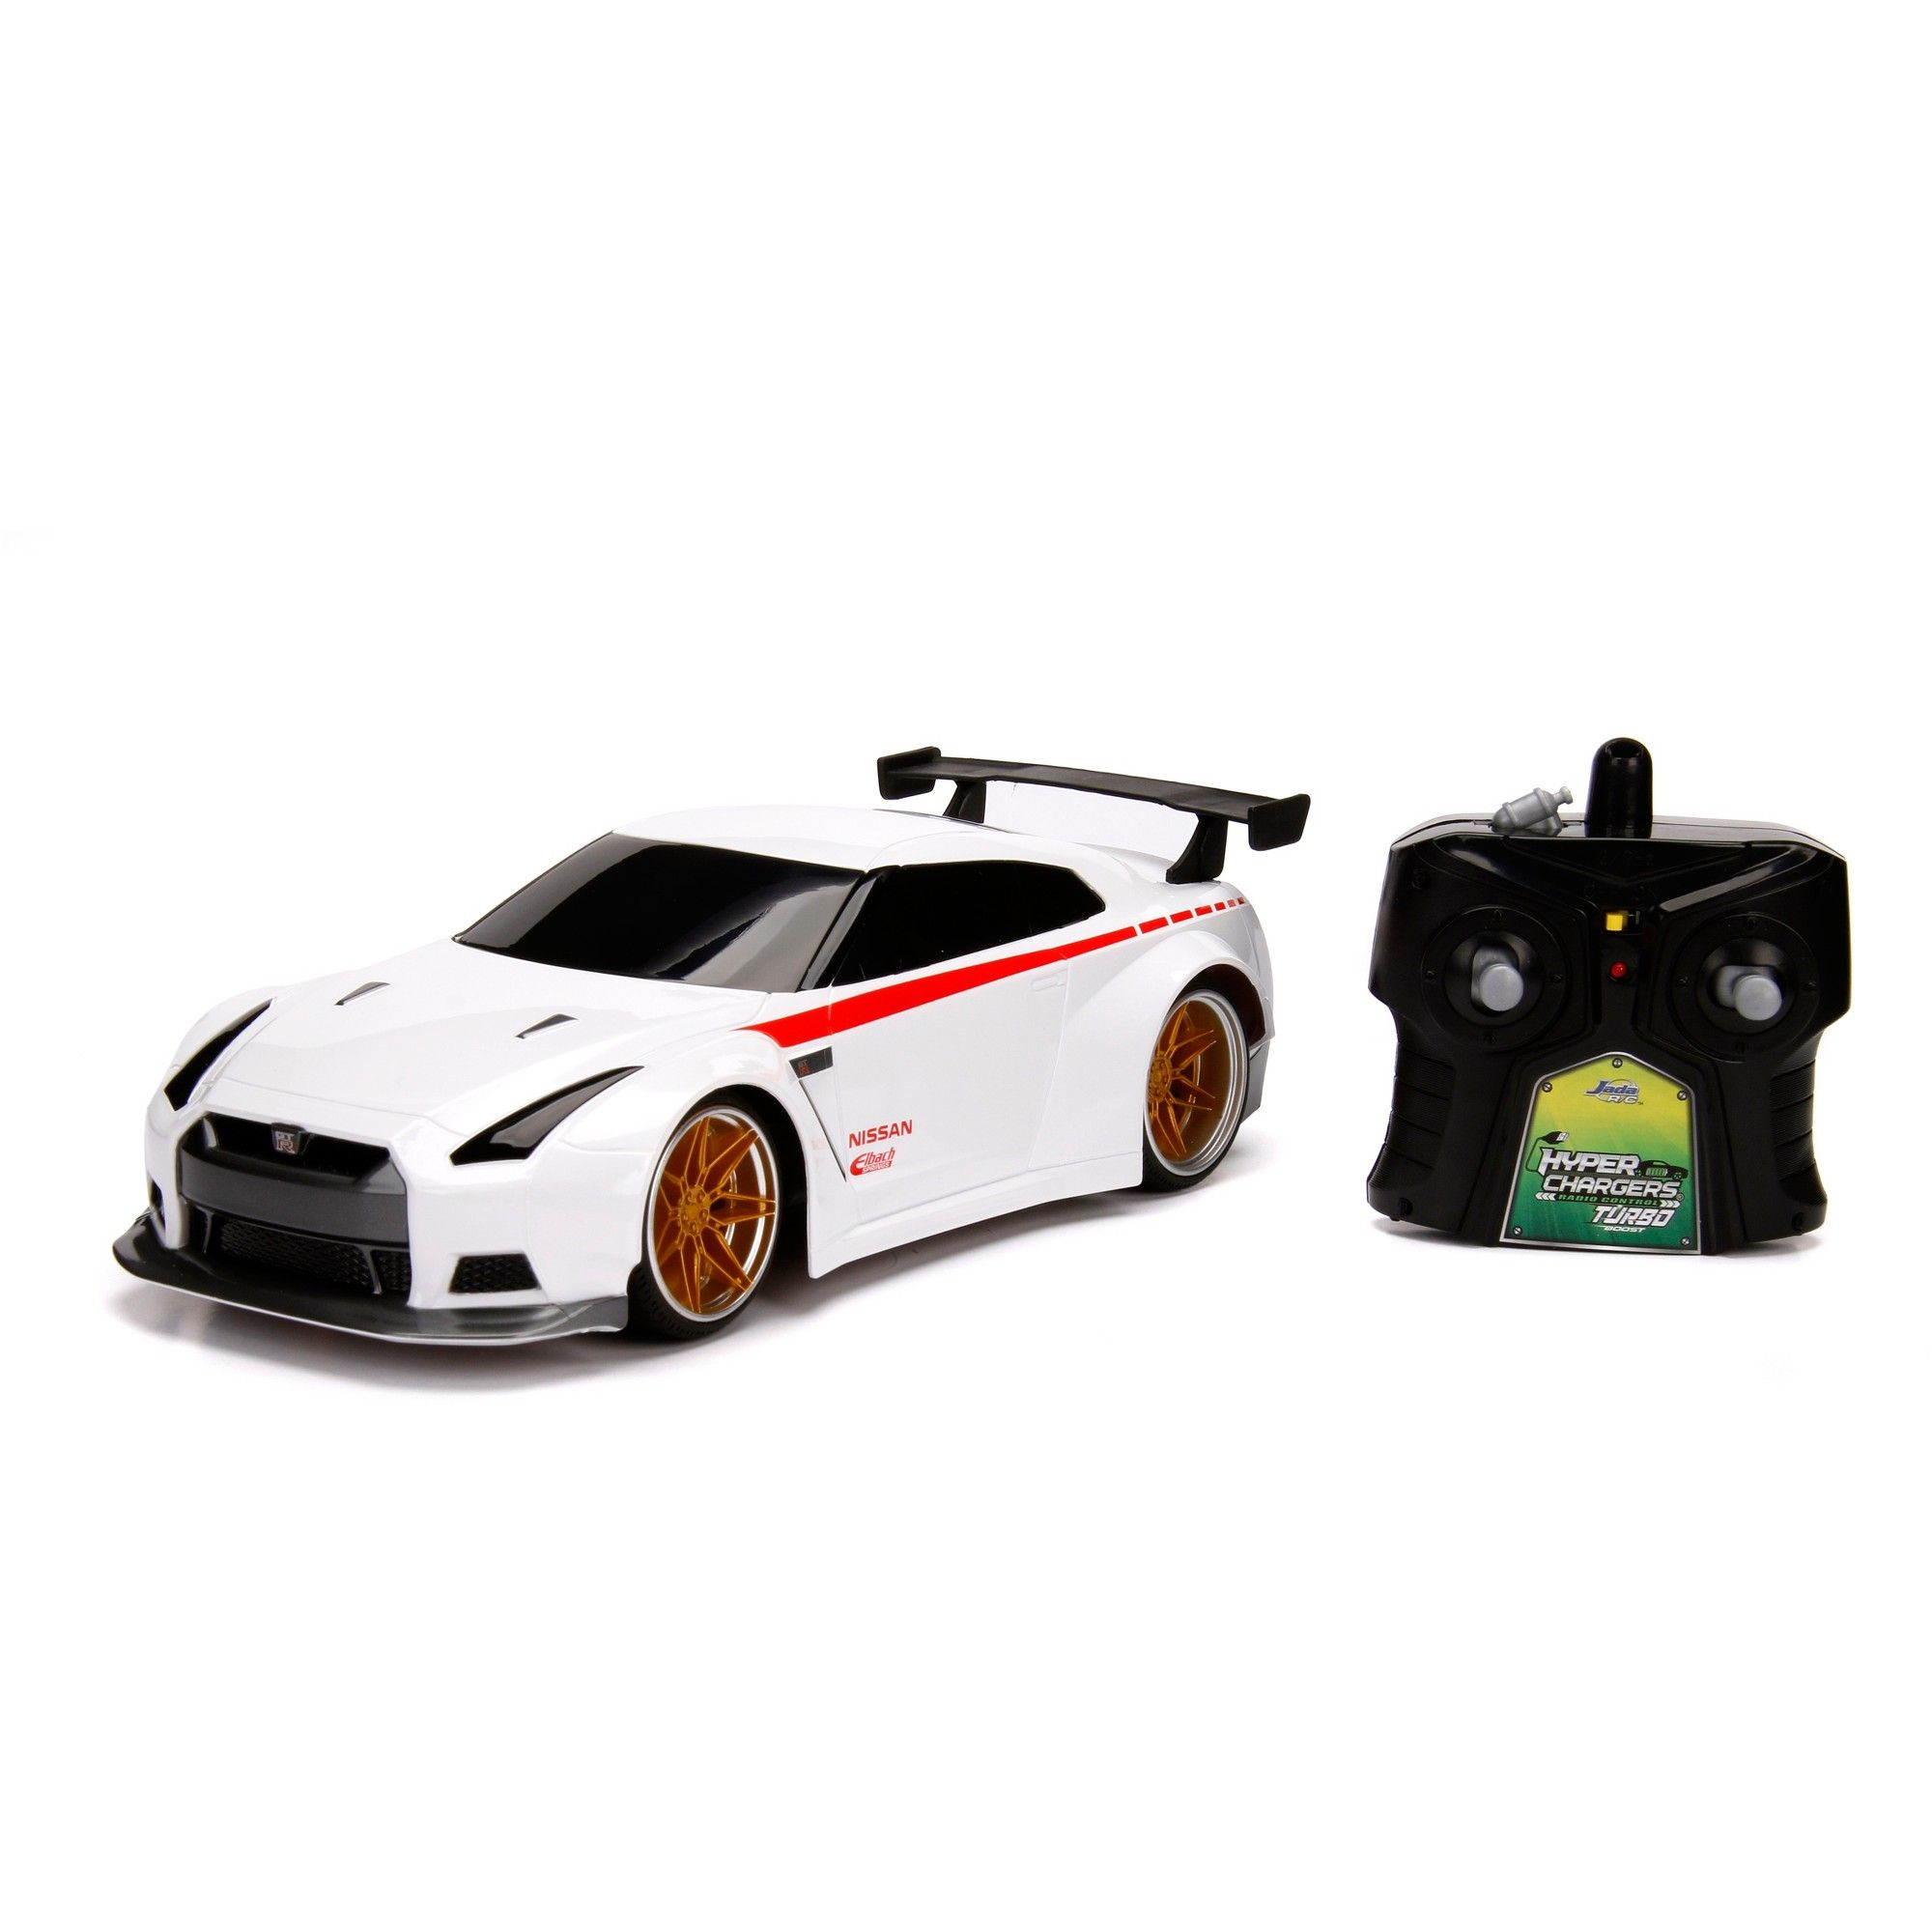 Jada Toys JDM Tuners RC 2009 Nissan GTR (R35) Remote